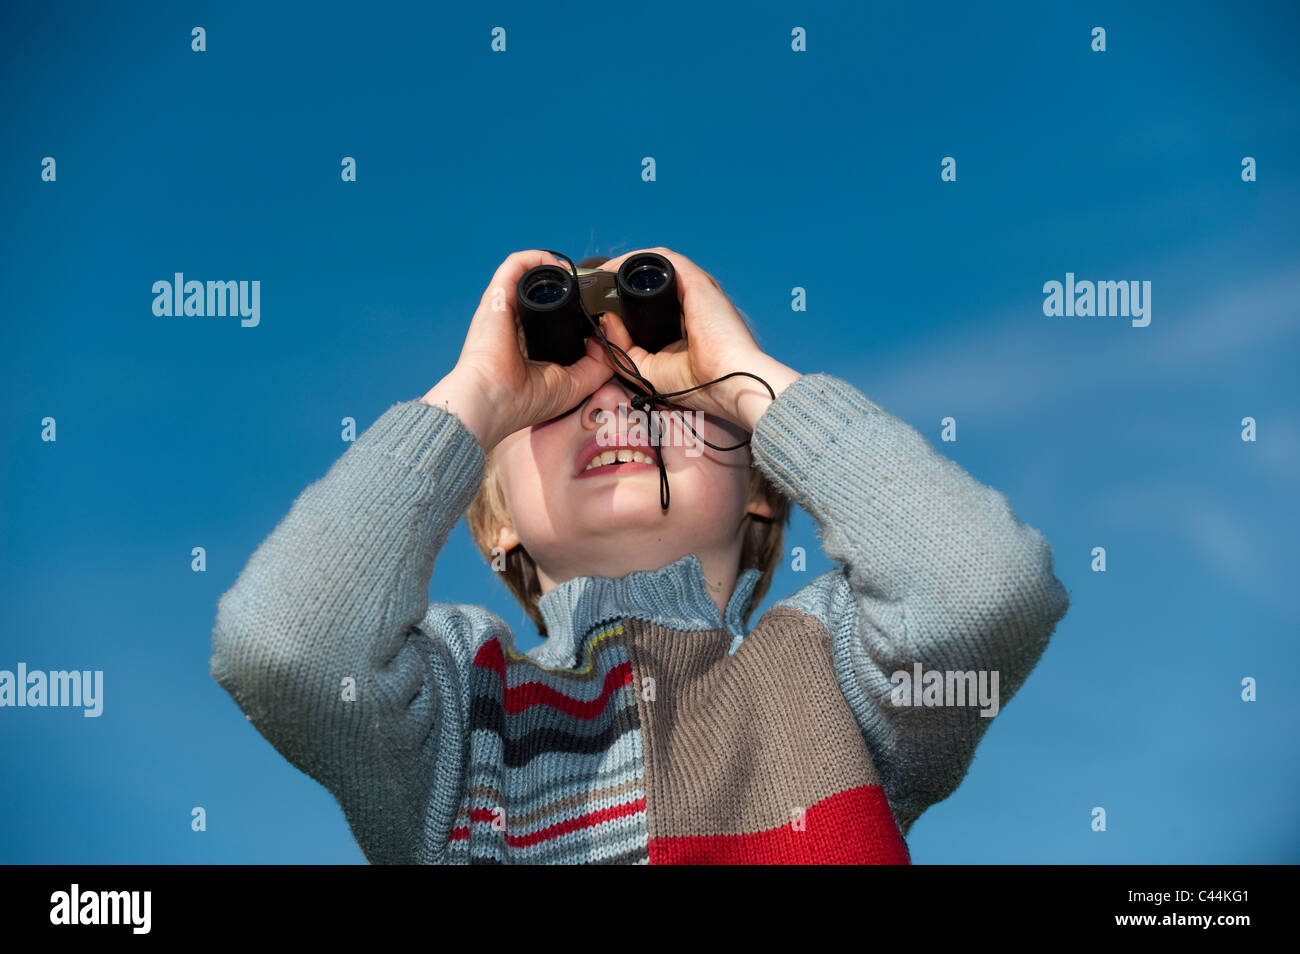 Young boy looking through binoculars - Stock Image